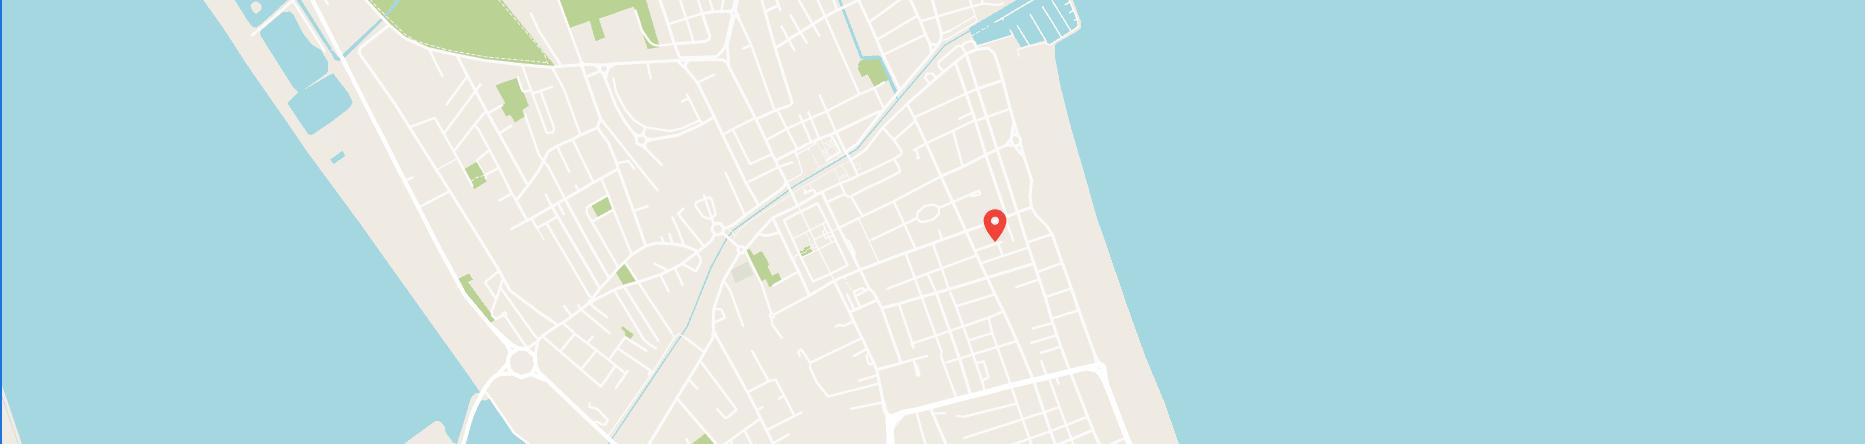 Hotel Cervia Carezza Mappa Via Caprera n.5